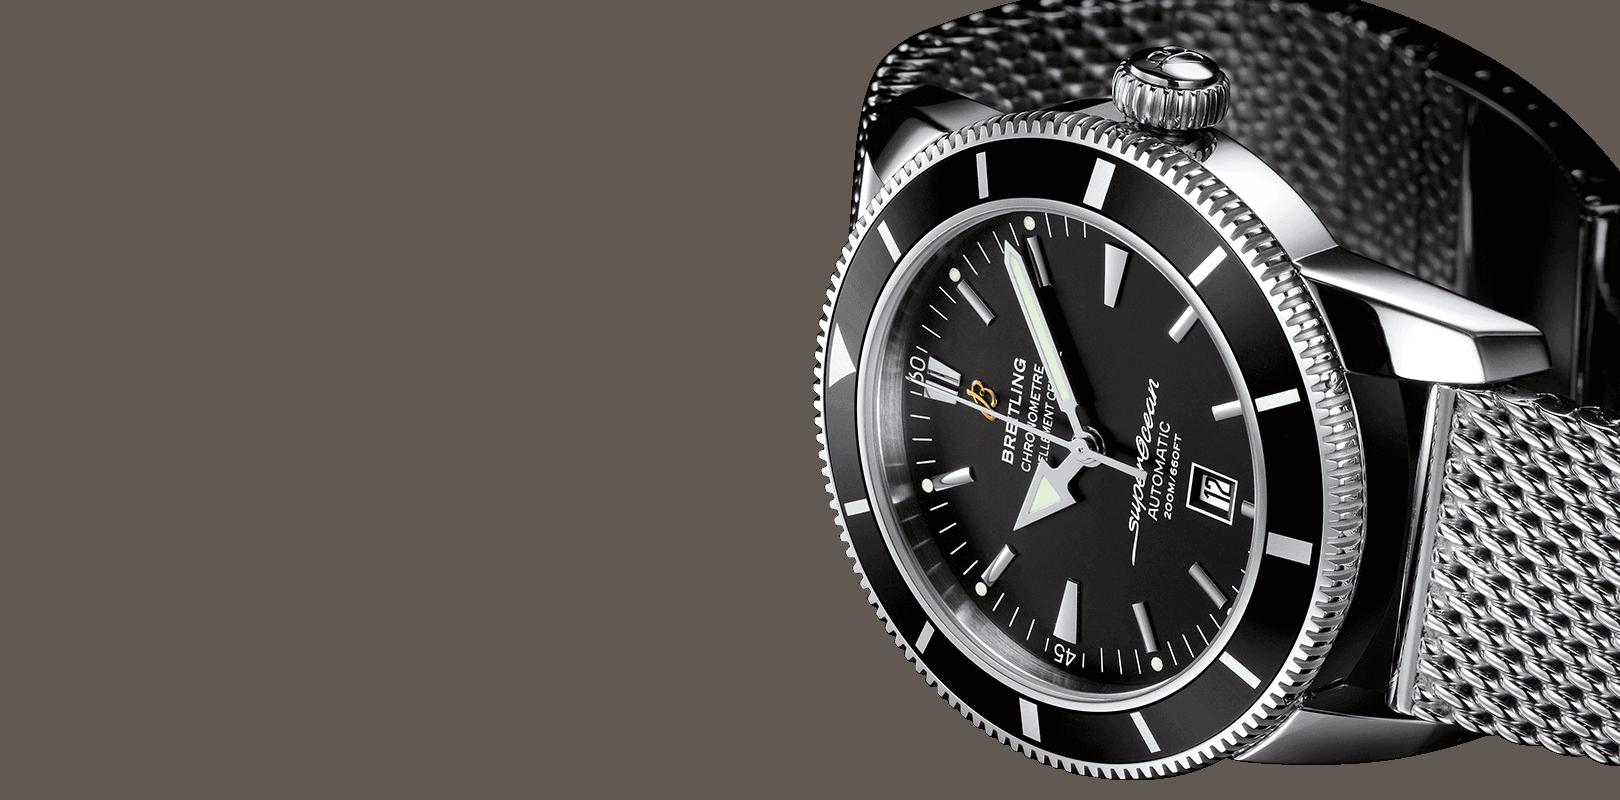 asset-version-3517a74f1f-superocean-heritage-46-1